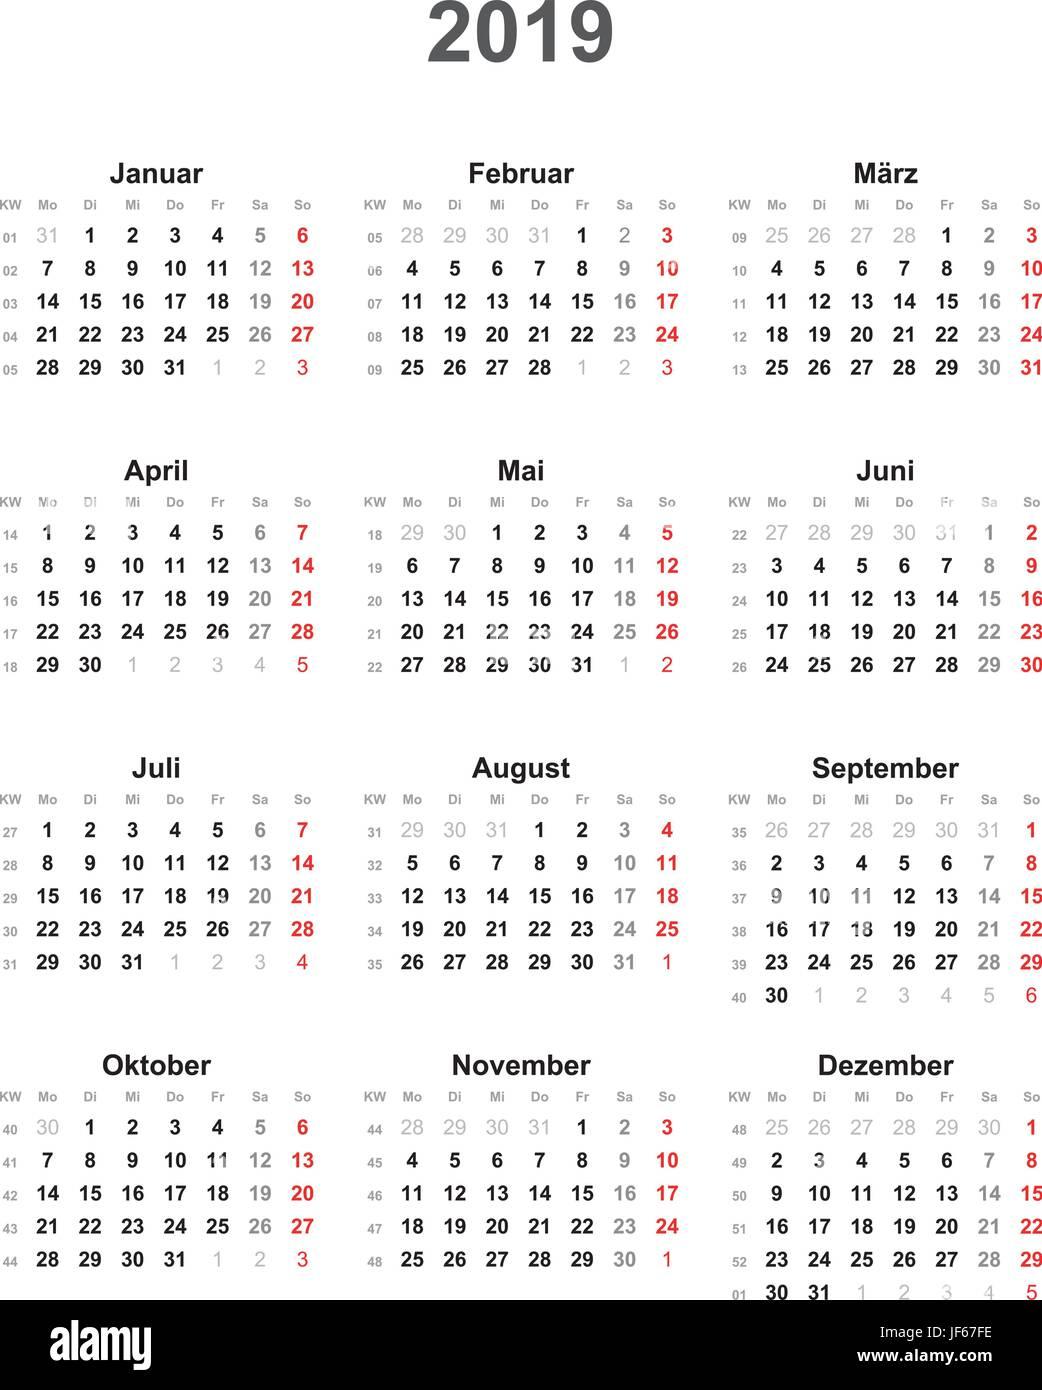 kalender 2019 universal au er an feiertagen vektor. Black Bedroom Furniture Sets. Home Design Ideas